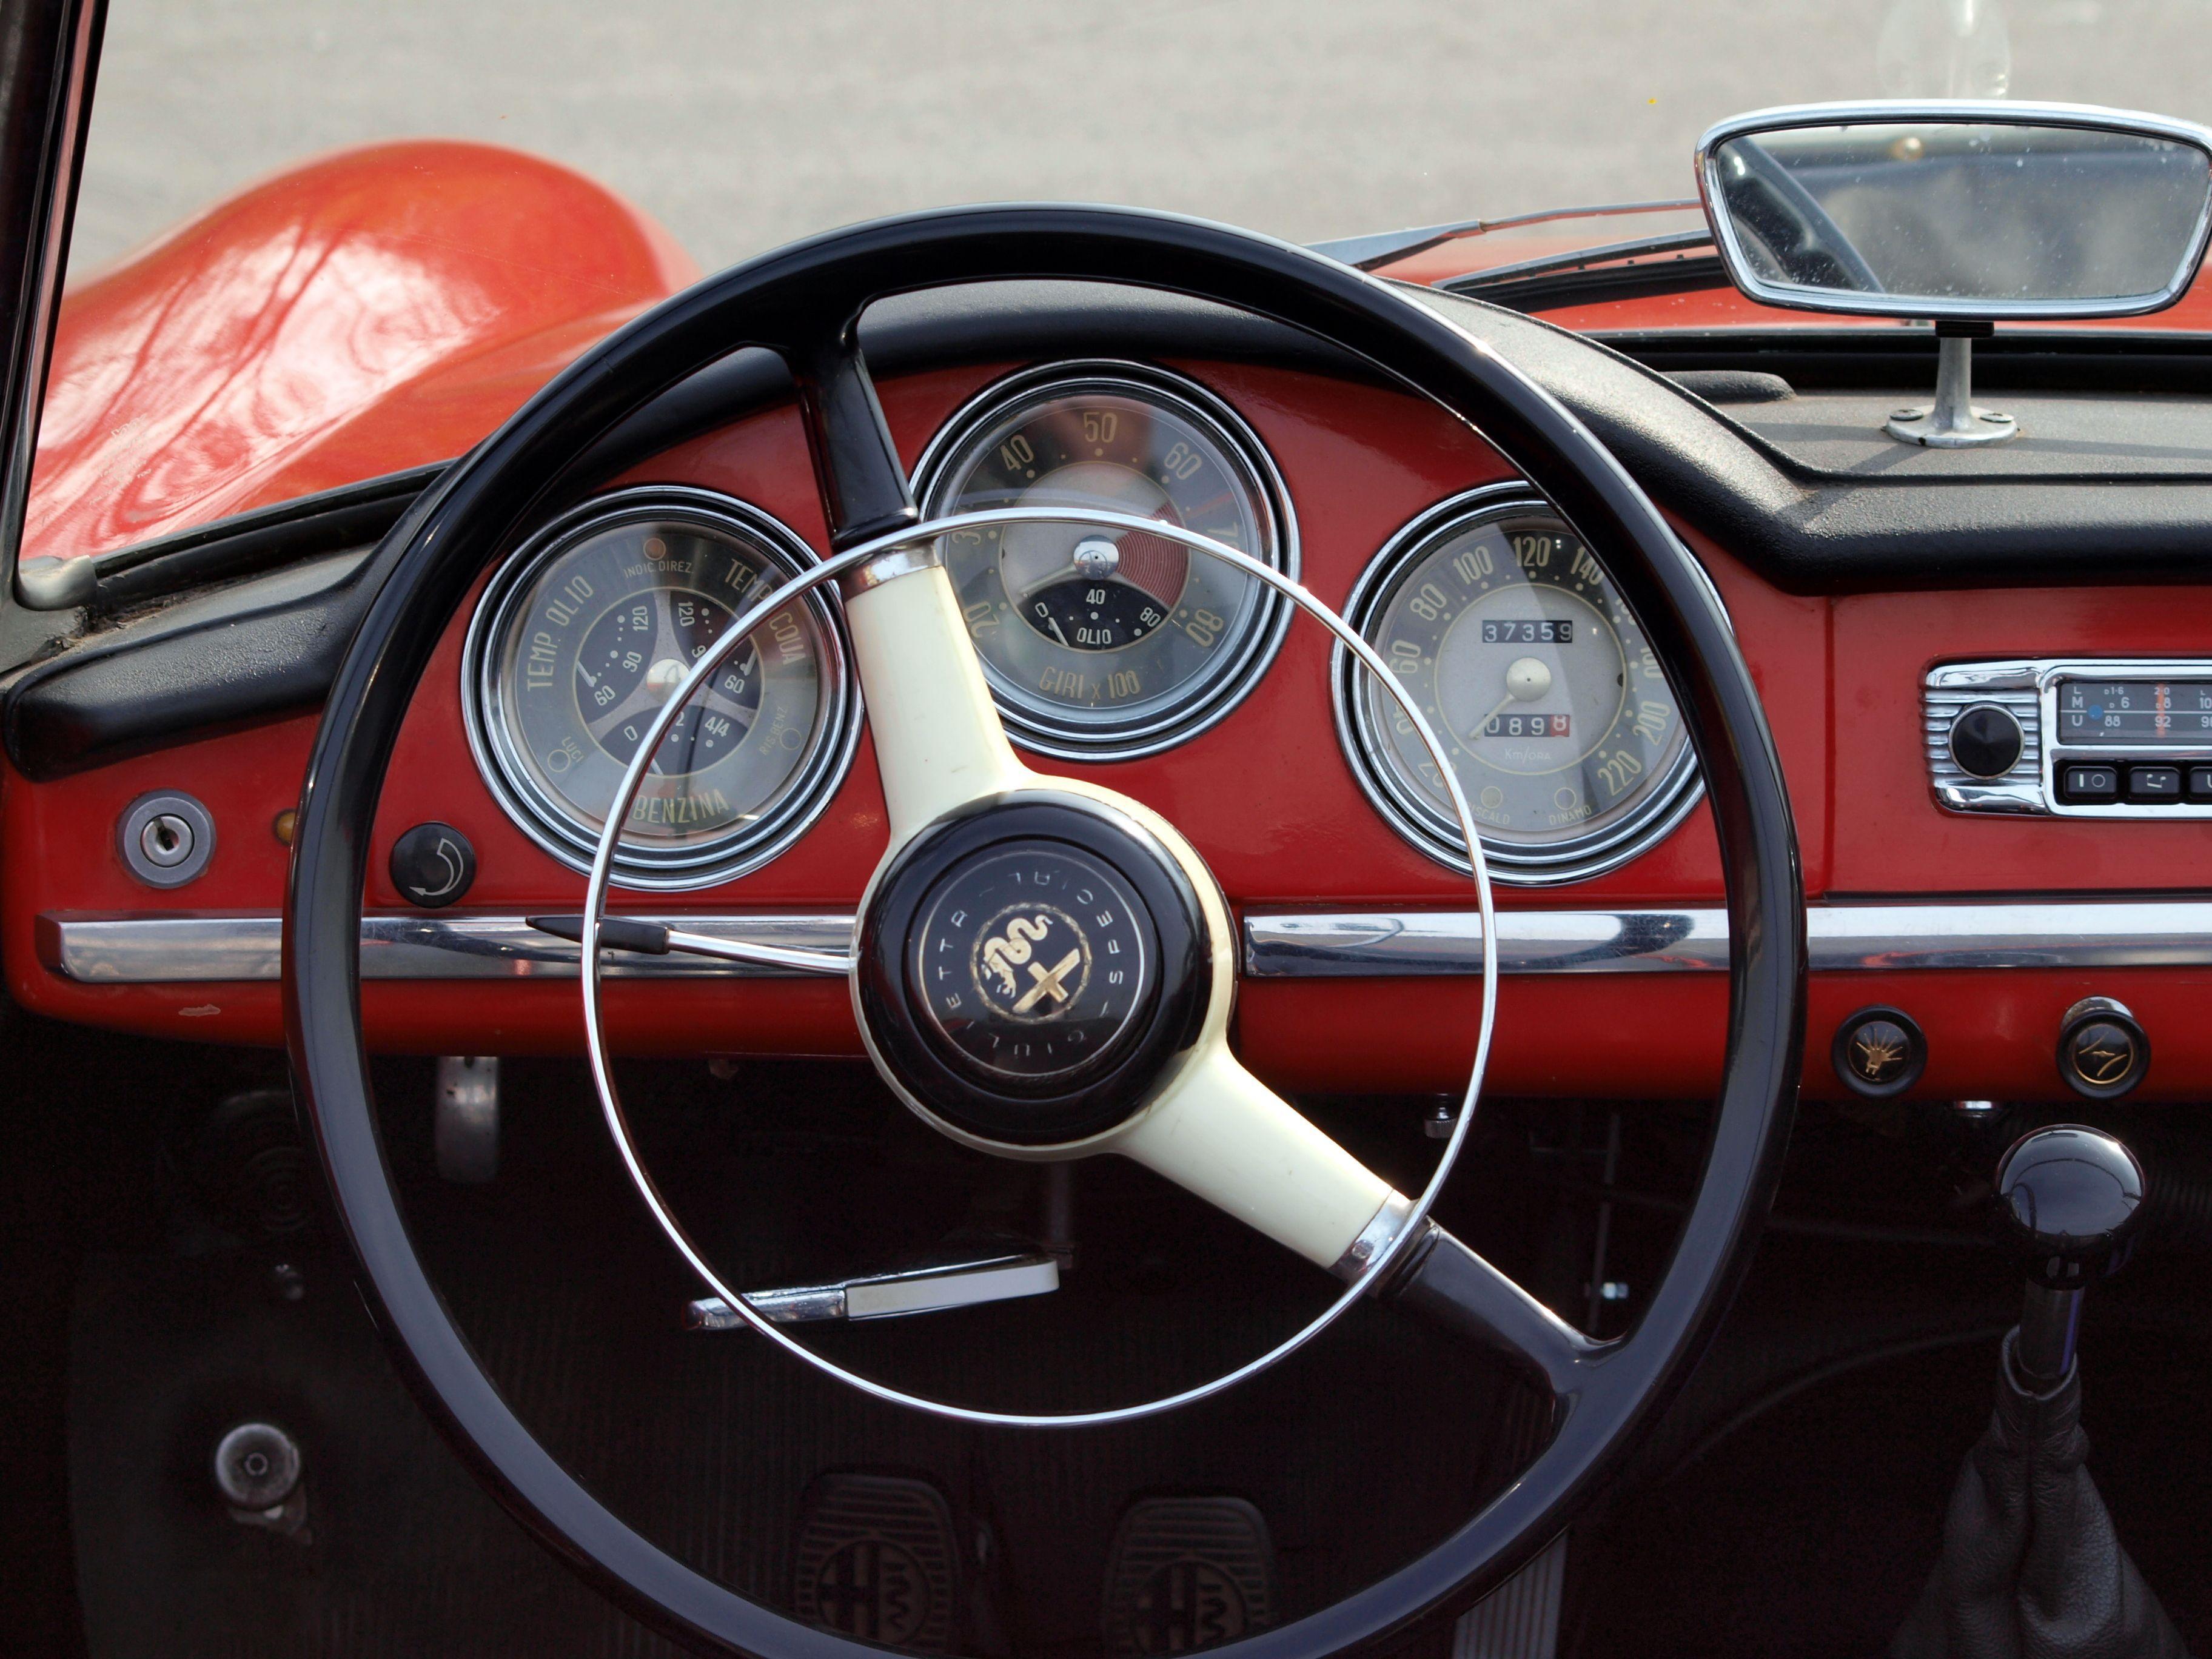 Alfa Romeo Giulia Spider prototype by Bertone 1963 interior